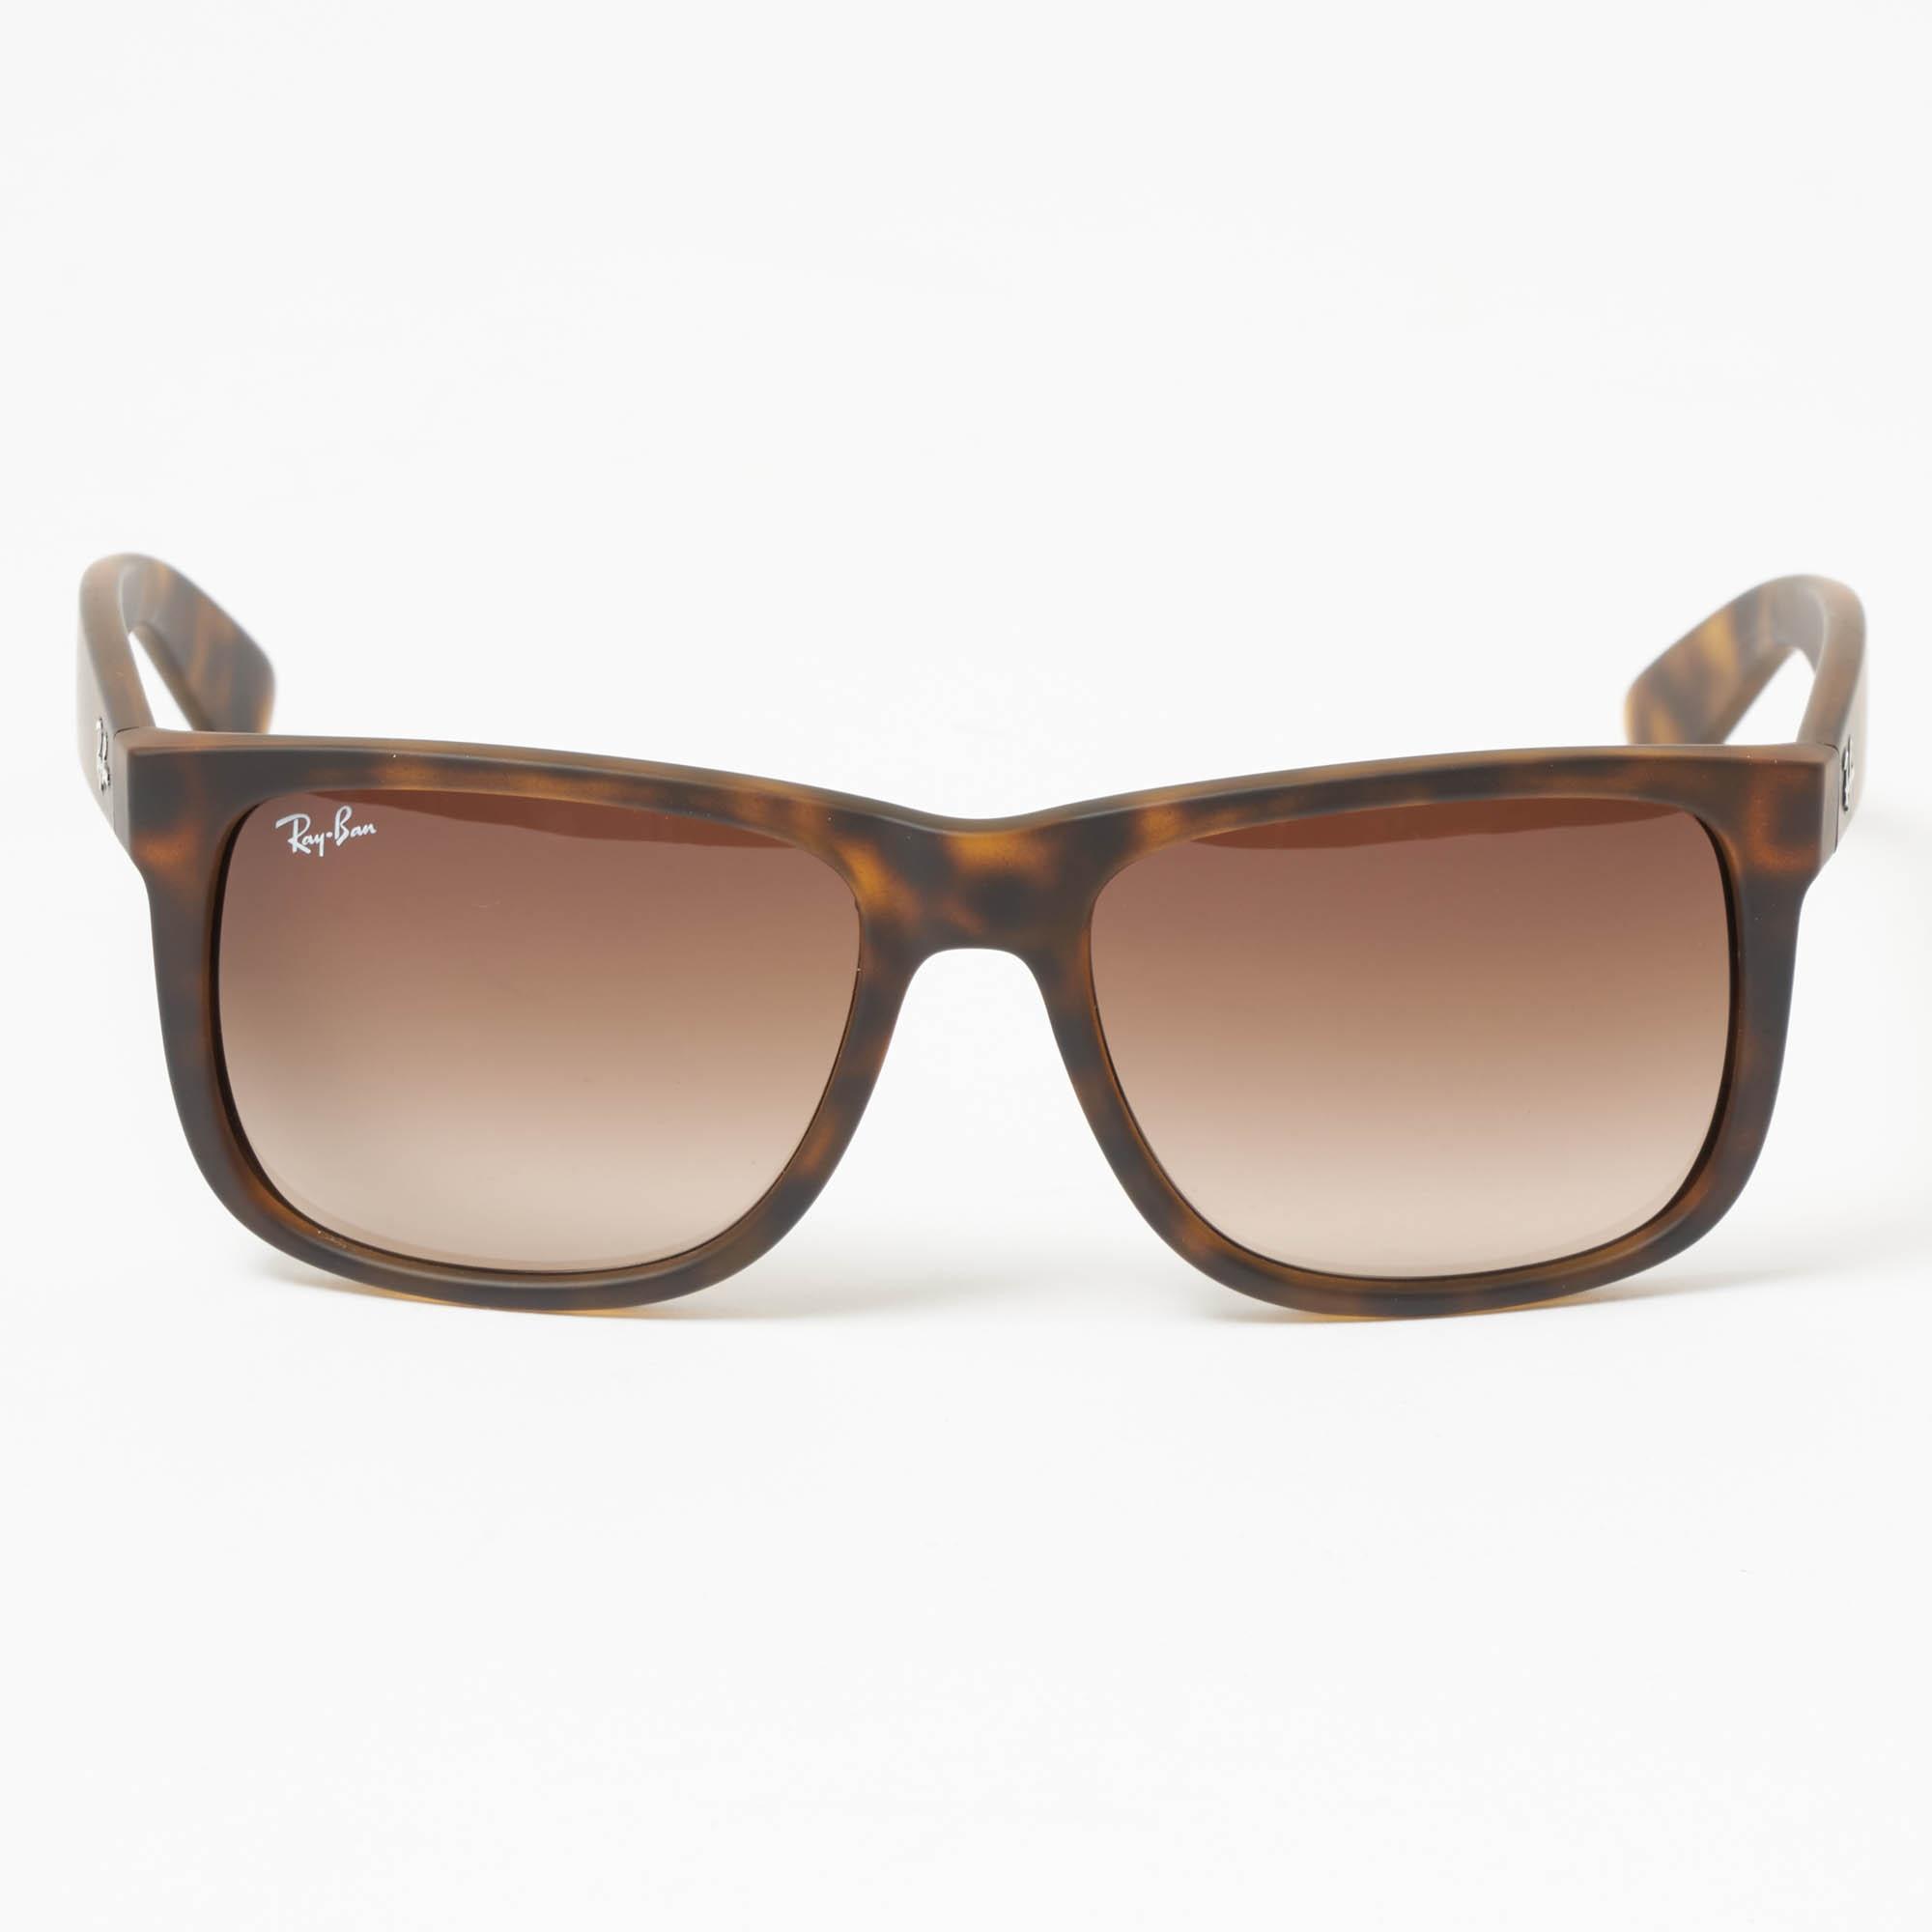 8c1cf629a7 ... Tortoise Justin Sunglasses - Brown Gradient Lenses for Men - Lyst. View  fullscreen